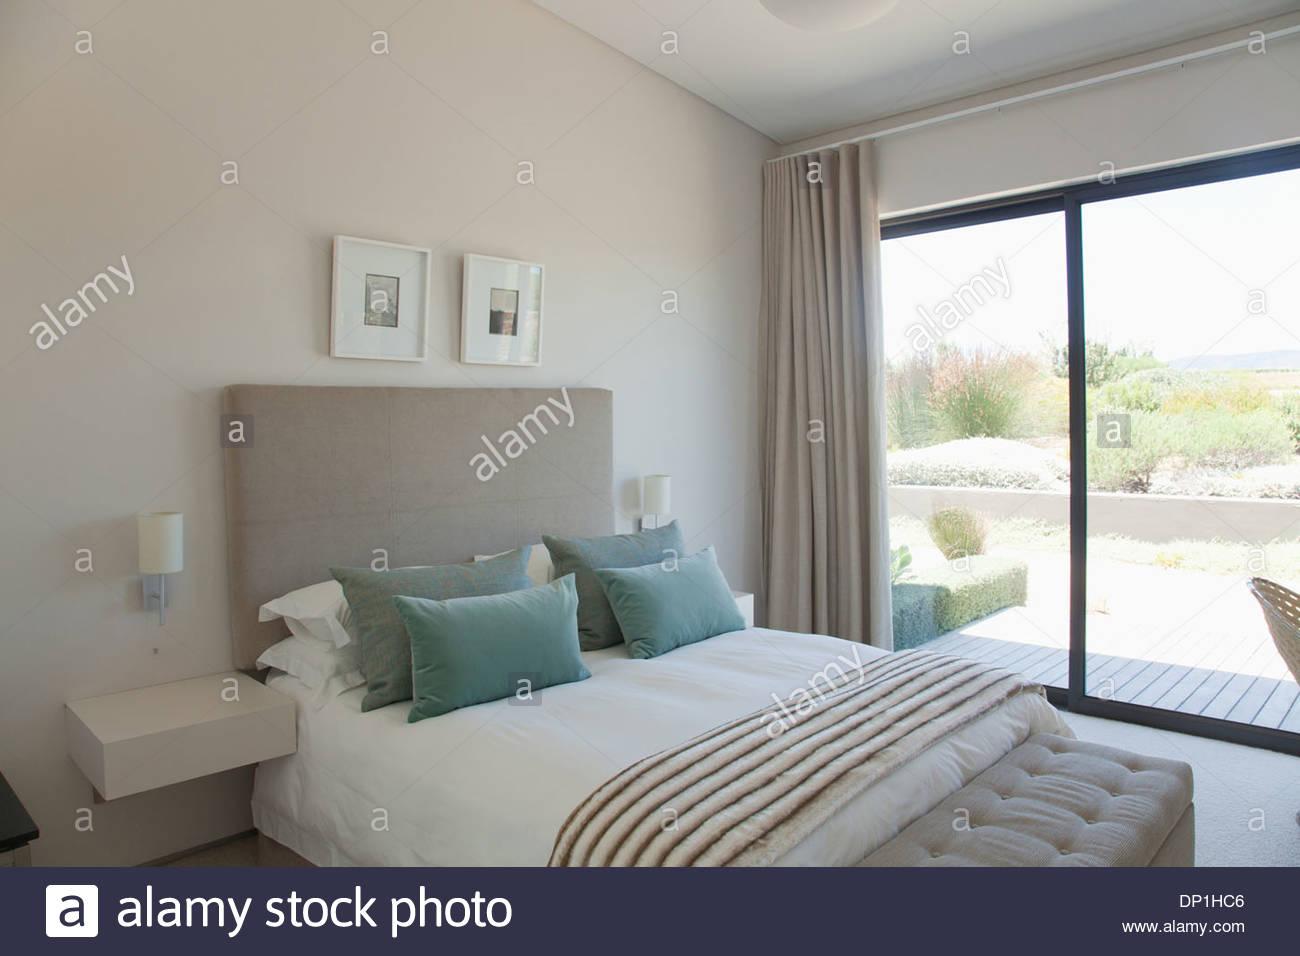 Dormitorio moderno Imagen De Stock